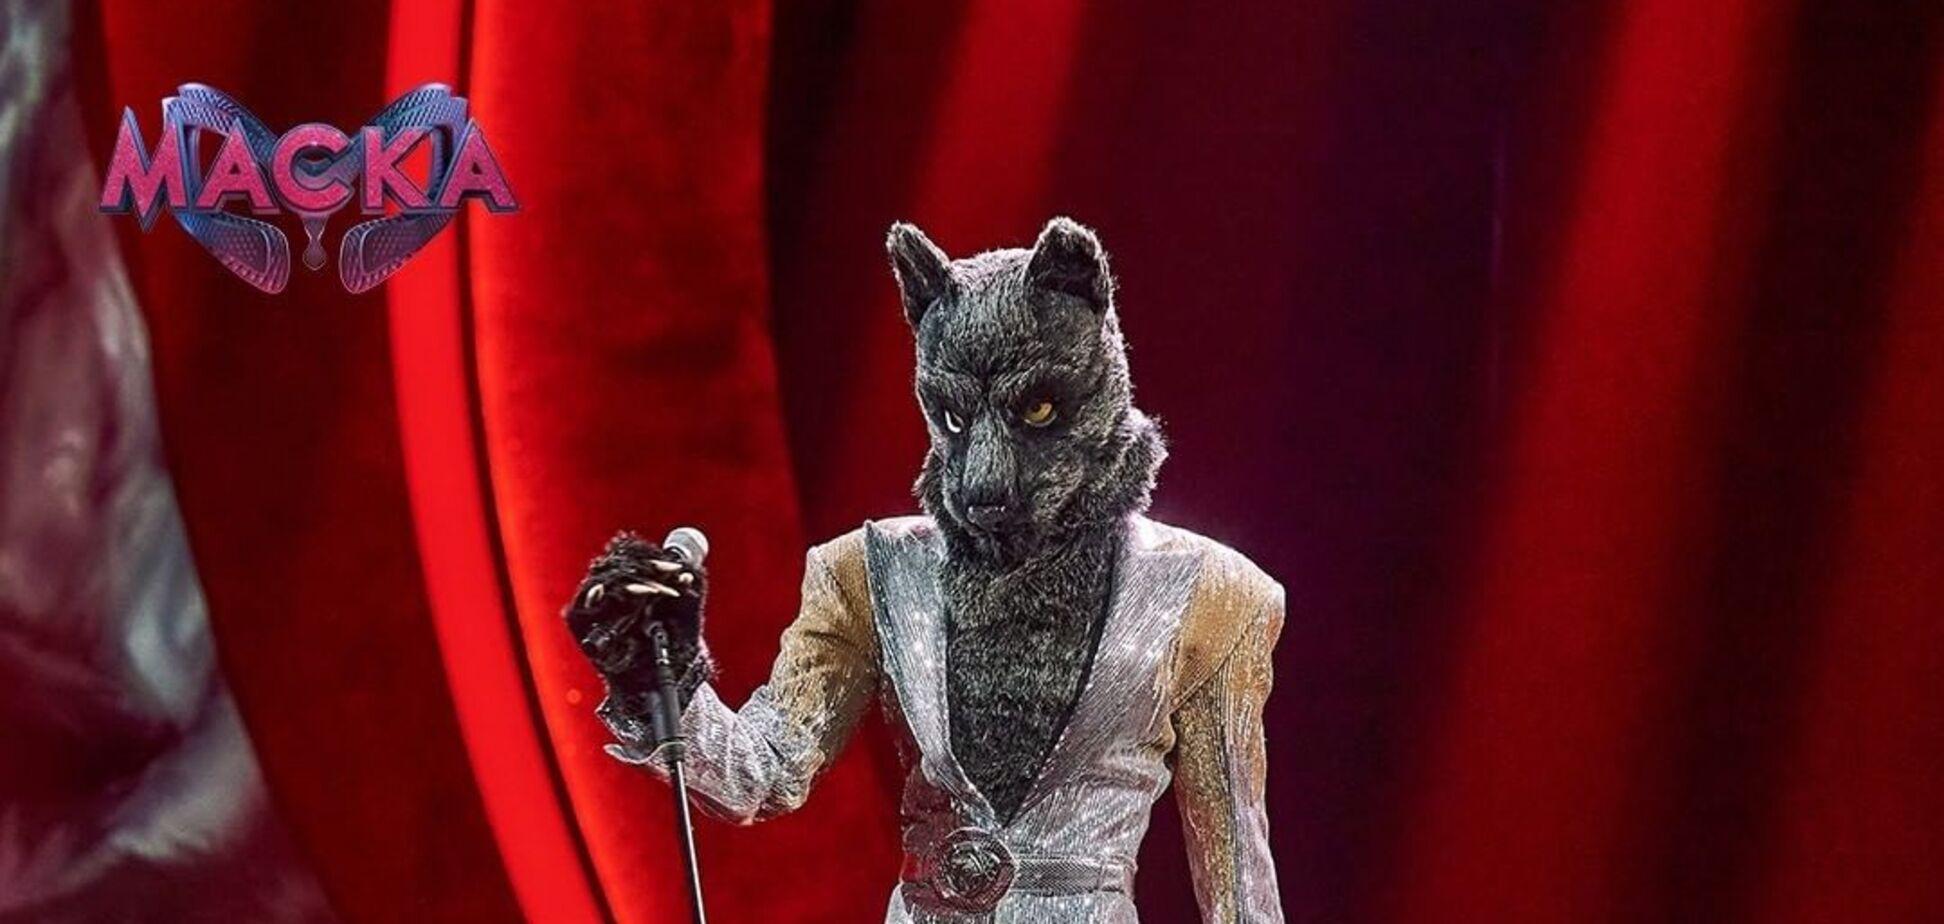 Участник в образе Волка на шоу 'Маска'